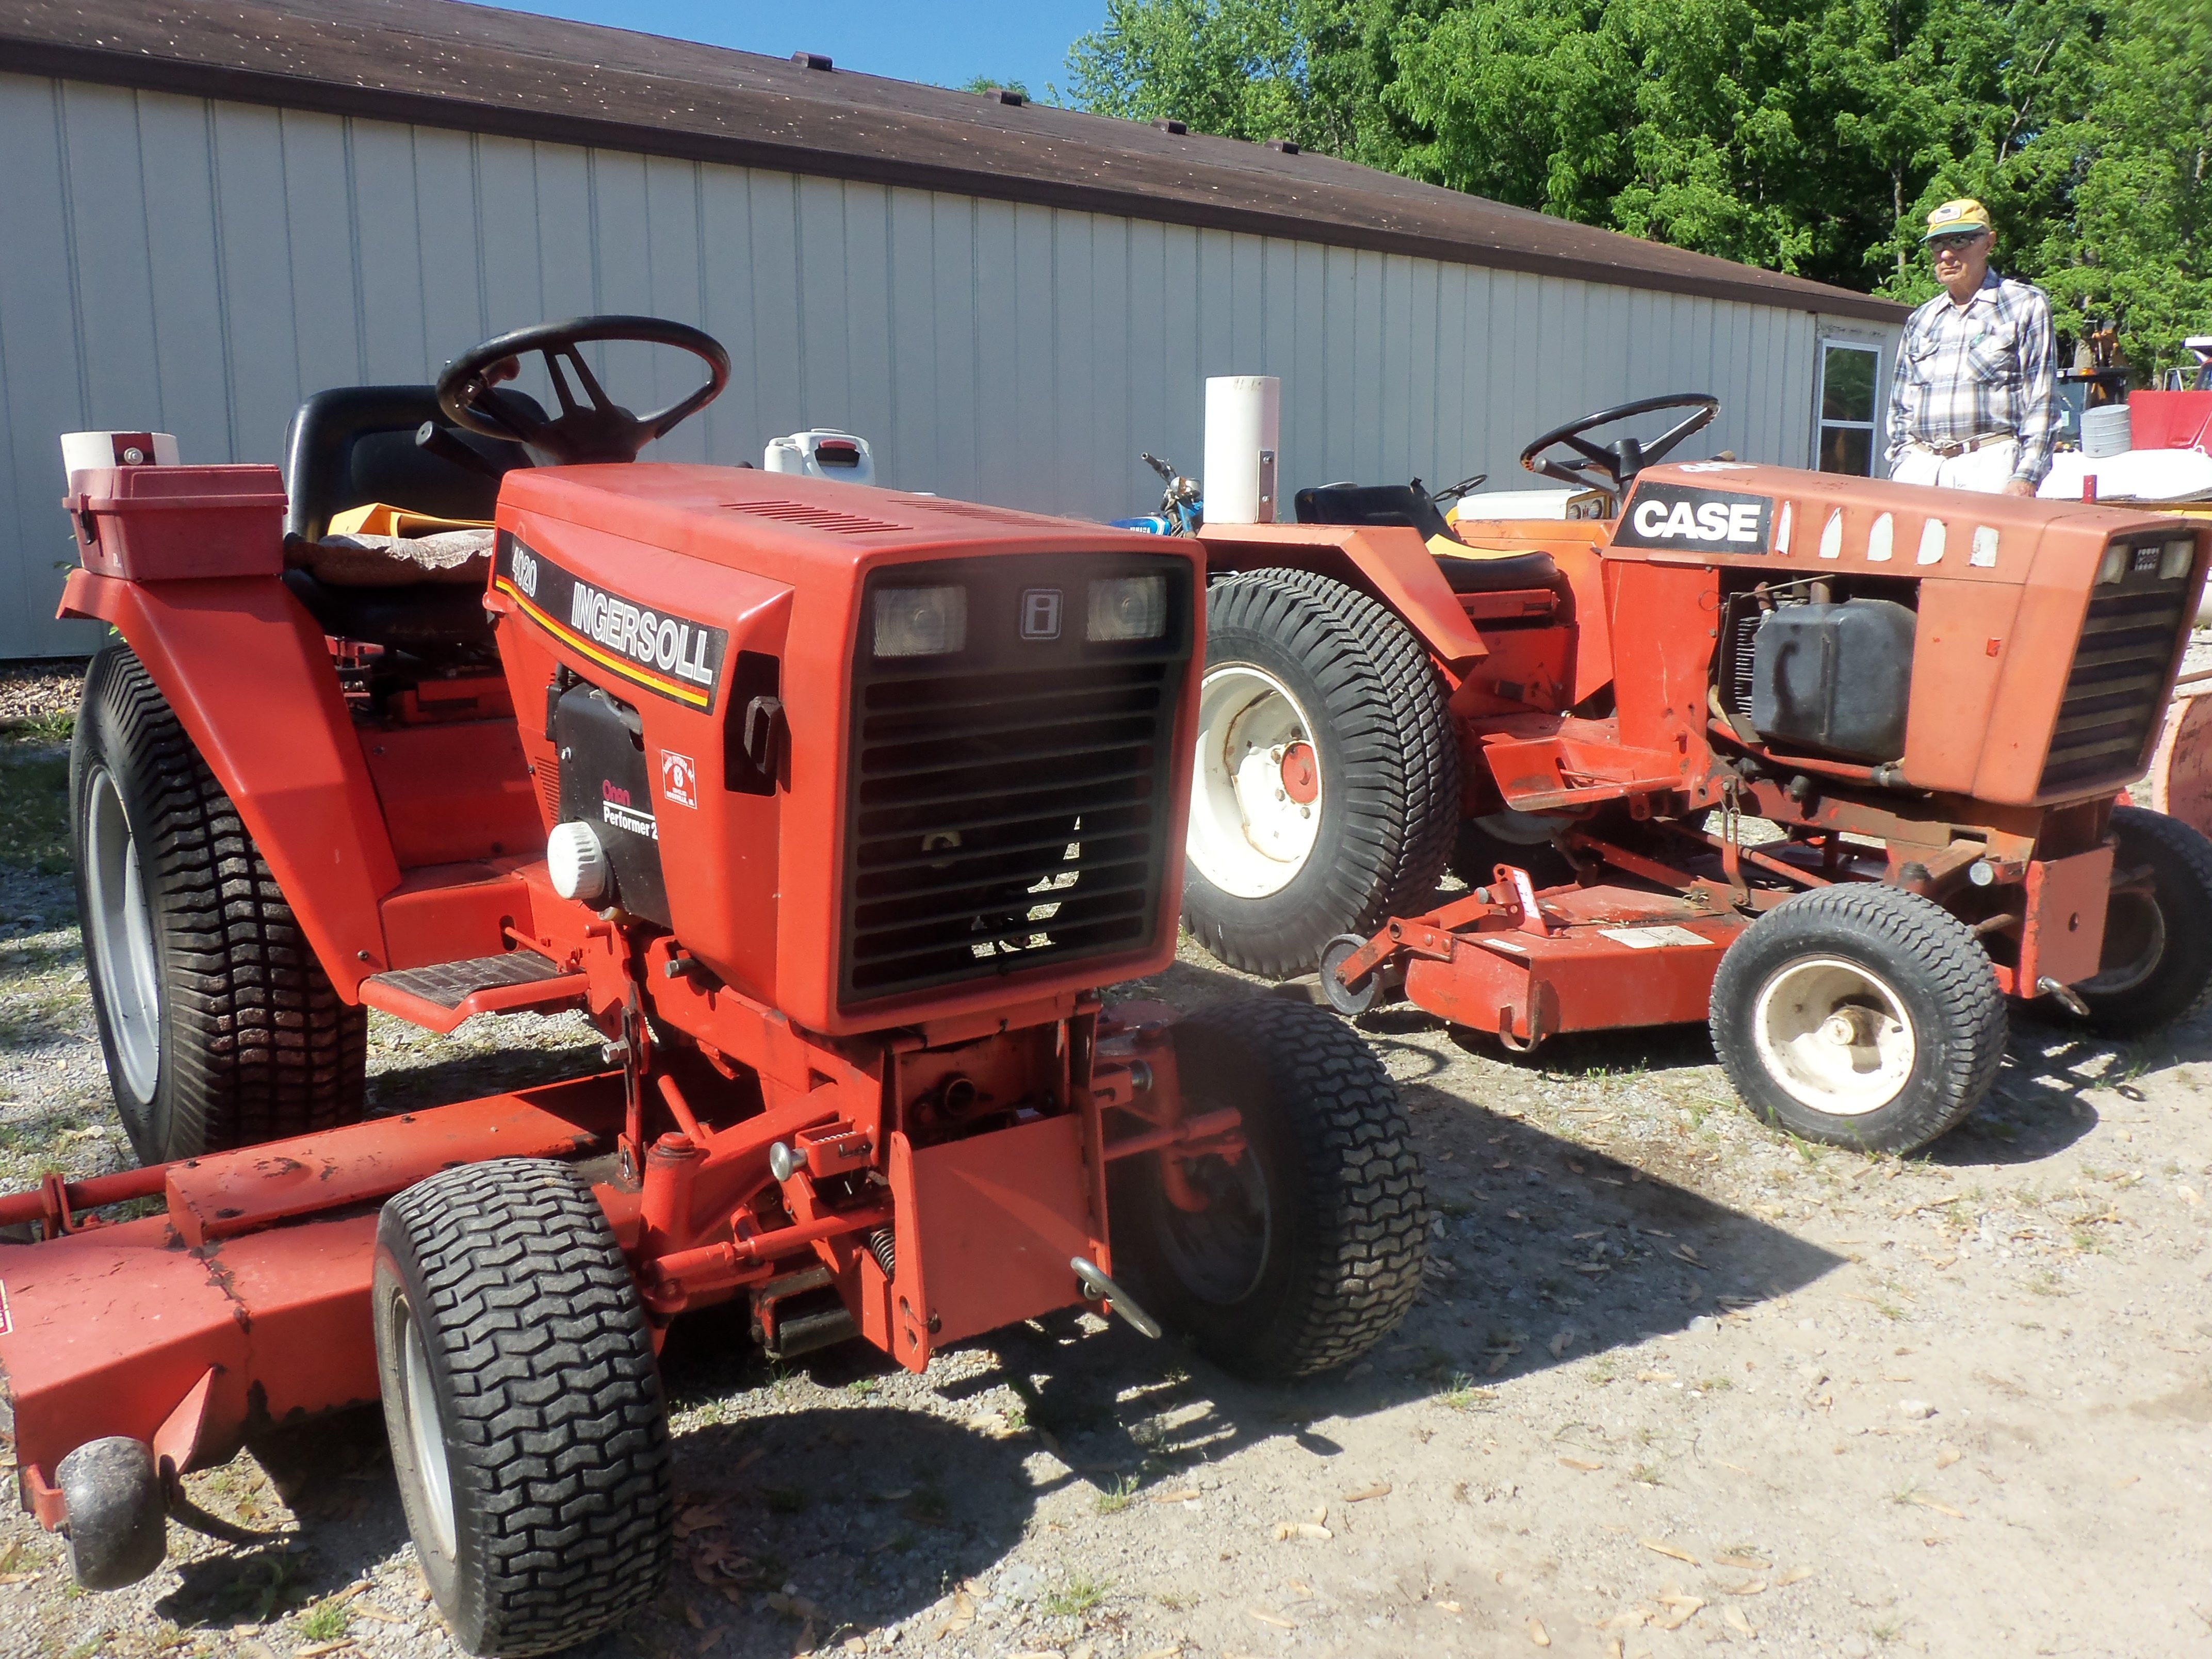 Rl Case 446 Garden Tractor Ingersoll 4020 J I Equipment. Rl Case 446 Garden Tractor Ingersoll 4020. Wiring. Case Ingersoll 4020 Wiring Harness At Scoala.co